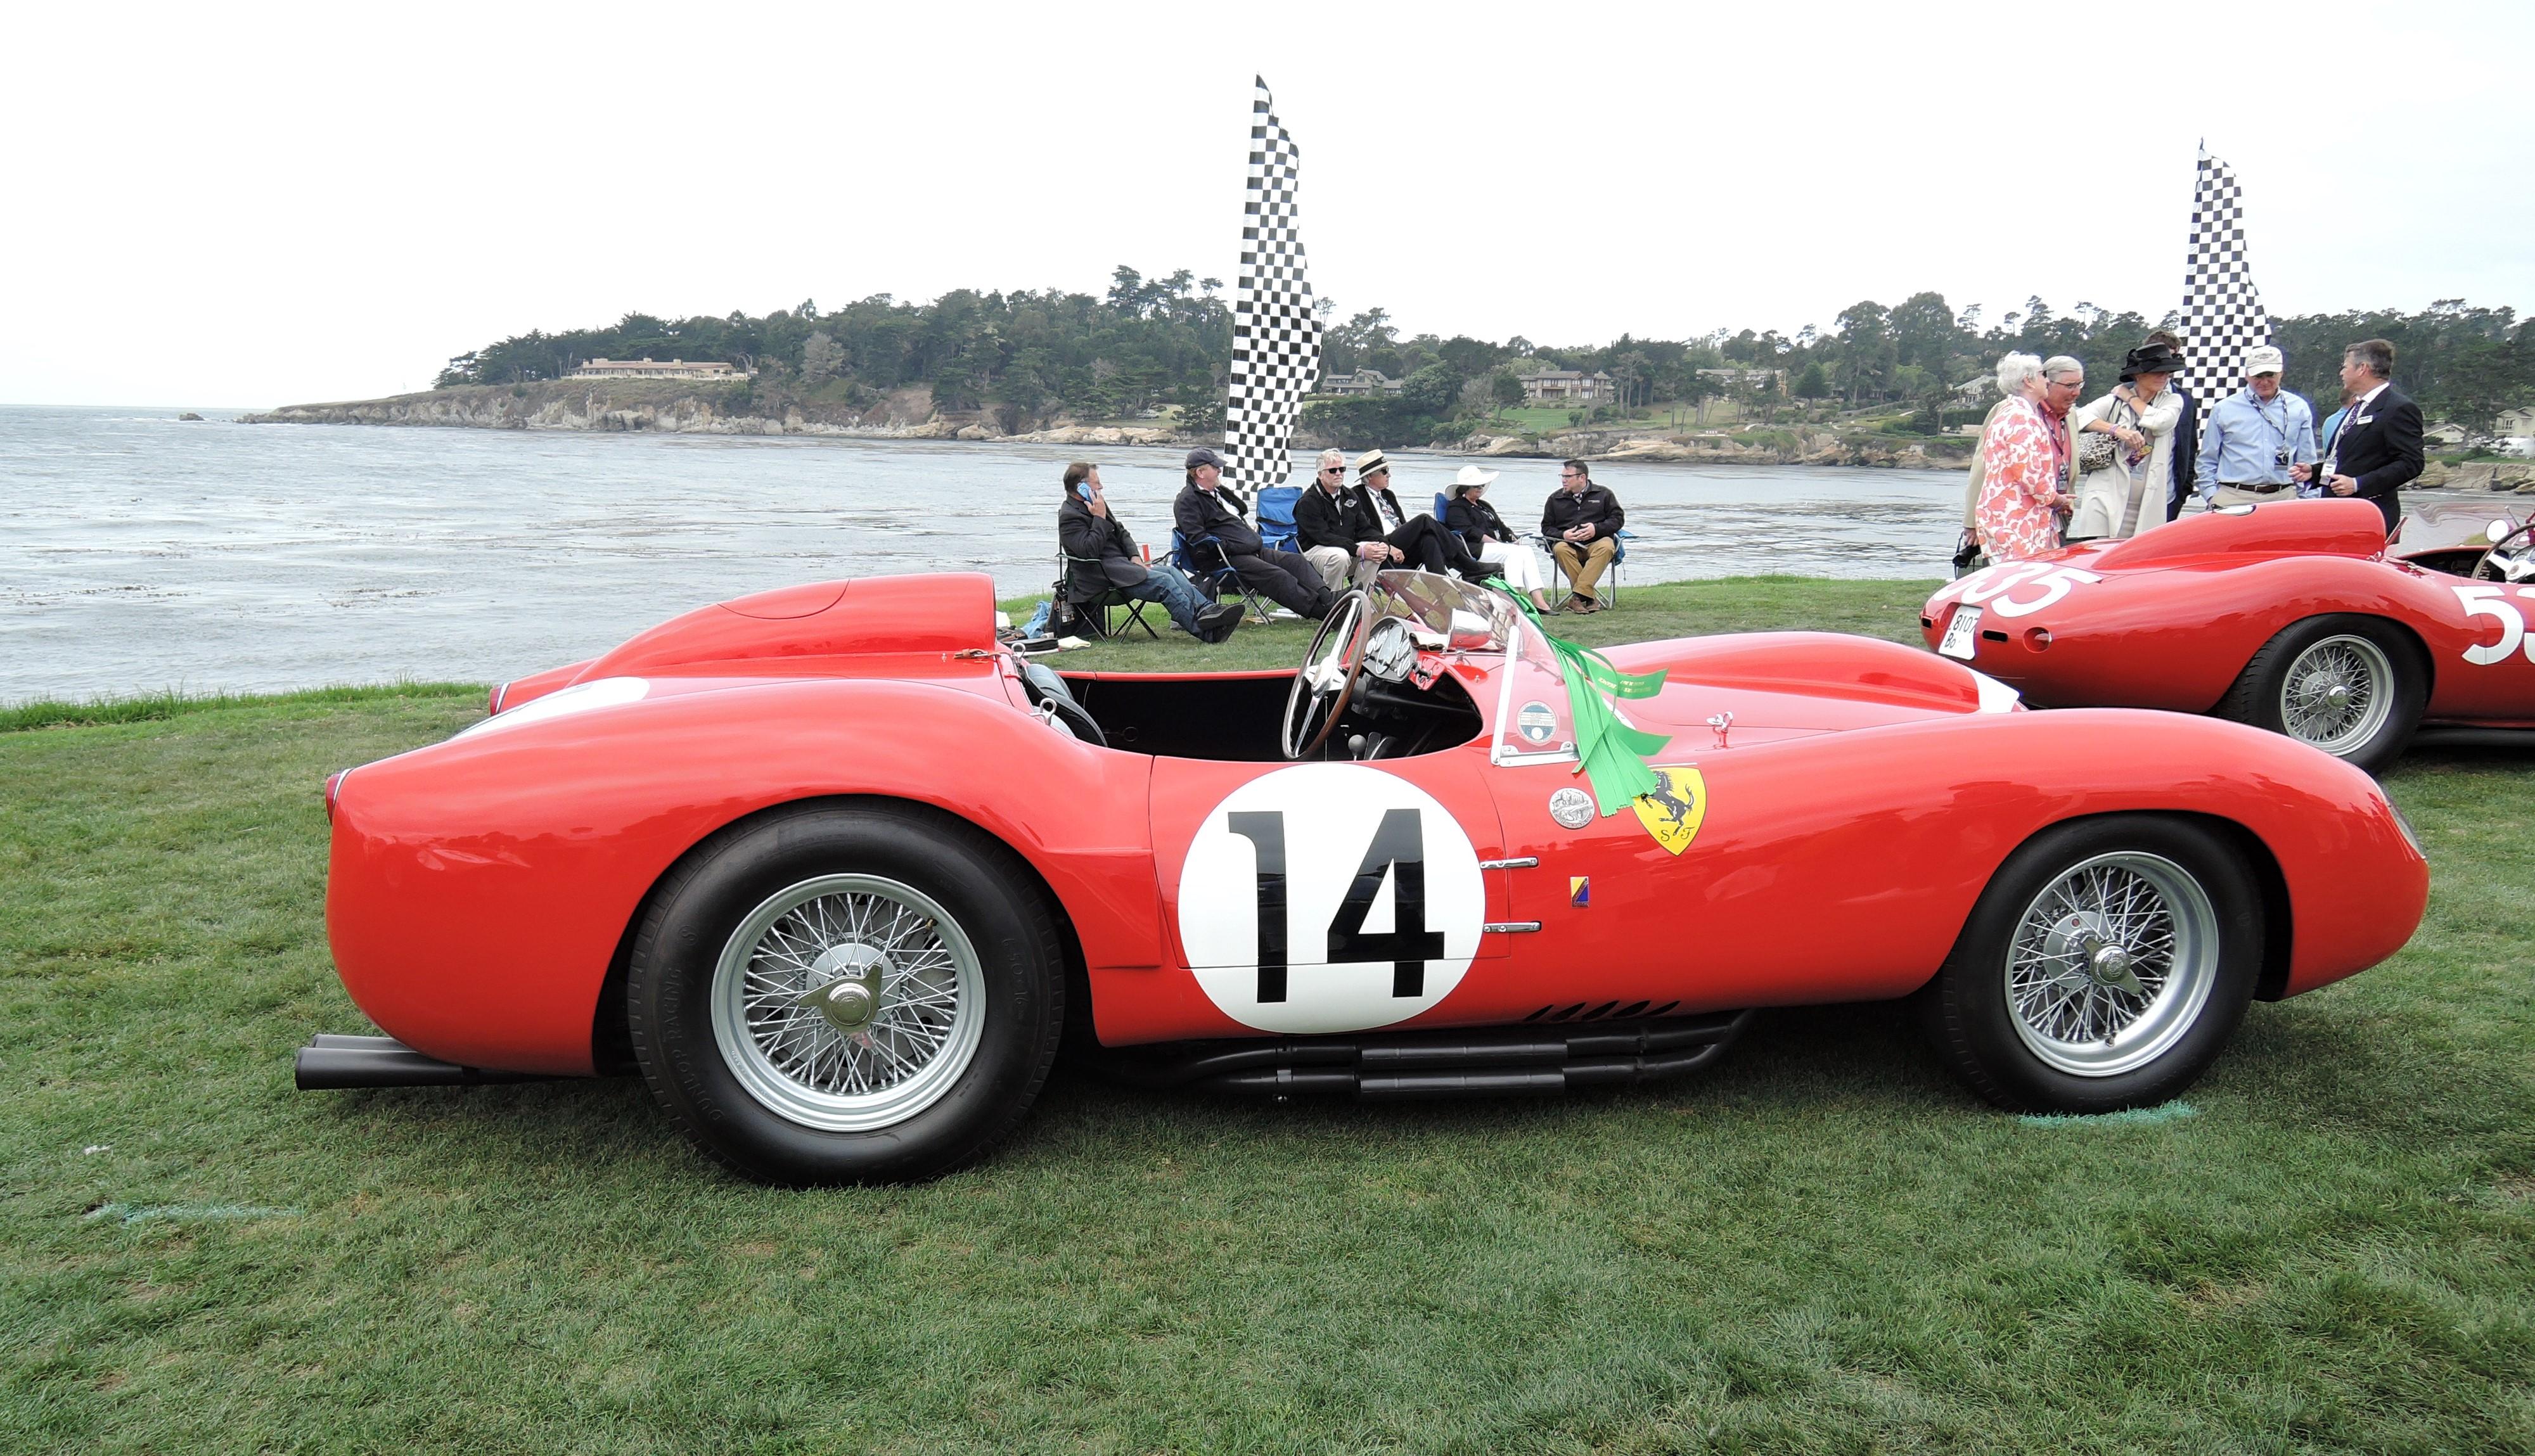 red 1958 Ferrari 250 Testa Rossa Scagliett Spyder; Sn 0728 - Pebble Beach Concours d'Elegance 2017